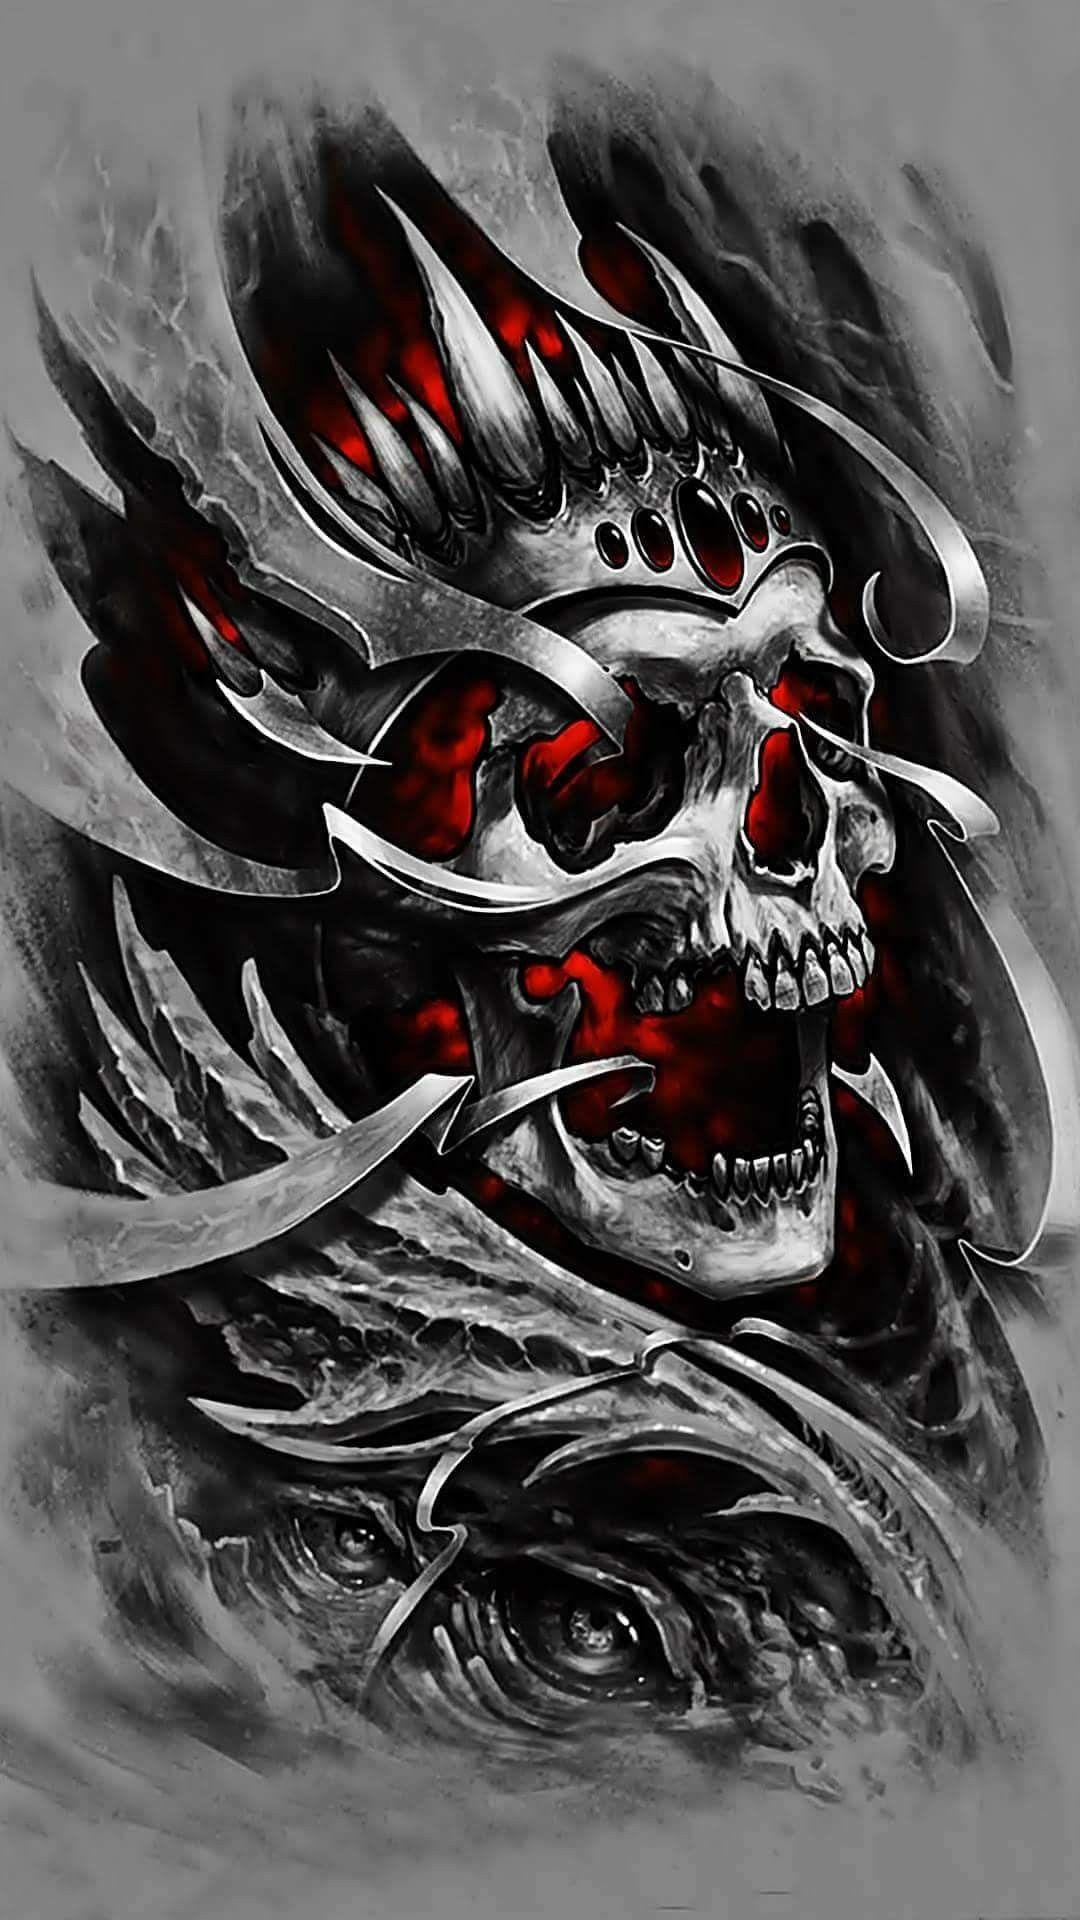 Check Our Store Www Brapwrap Com Motorcycle Gear Jackets Hoodies Rings Bracelets Helmets Watches Skull Artwork Skull Wallpaper Skull Stencil Skull tattoo 4k wallpaper